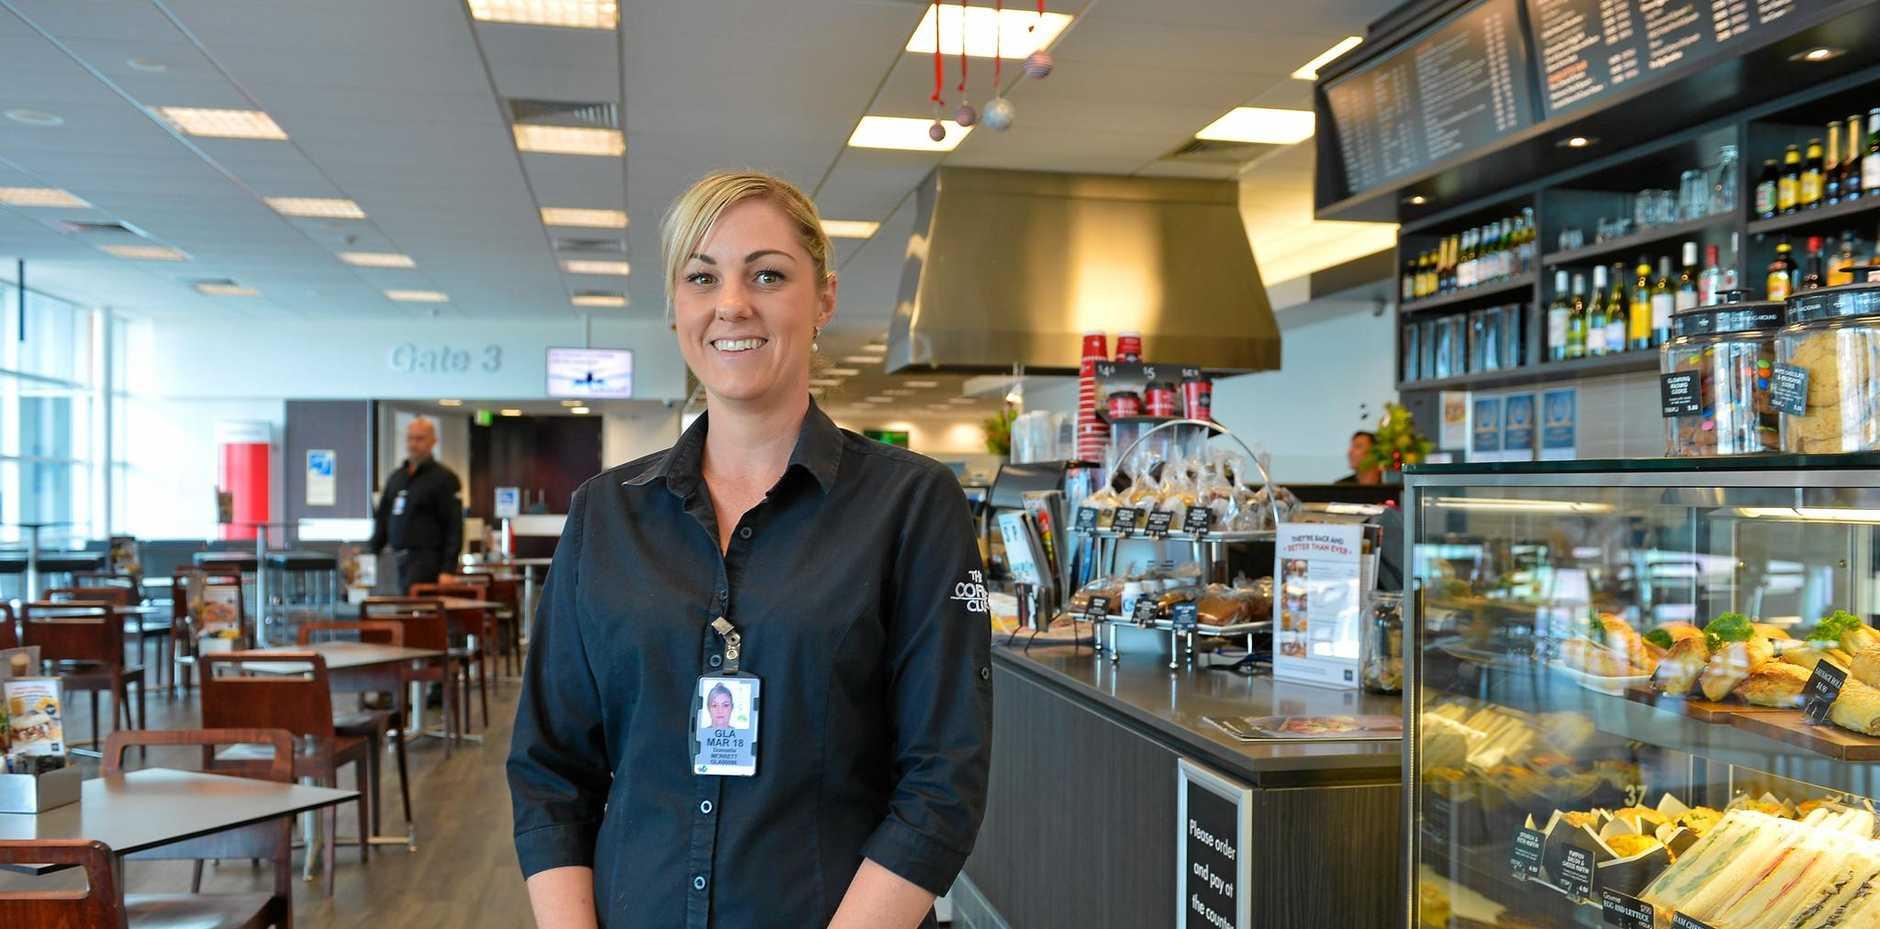 TOP BREW: Coffee Club franchise owner Donnella Merrett loves her new job.